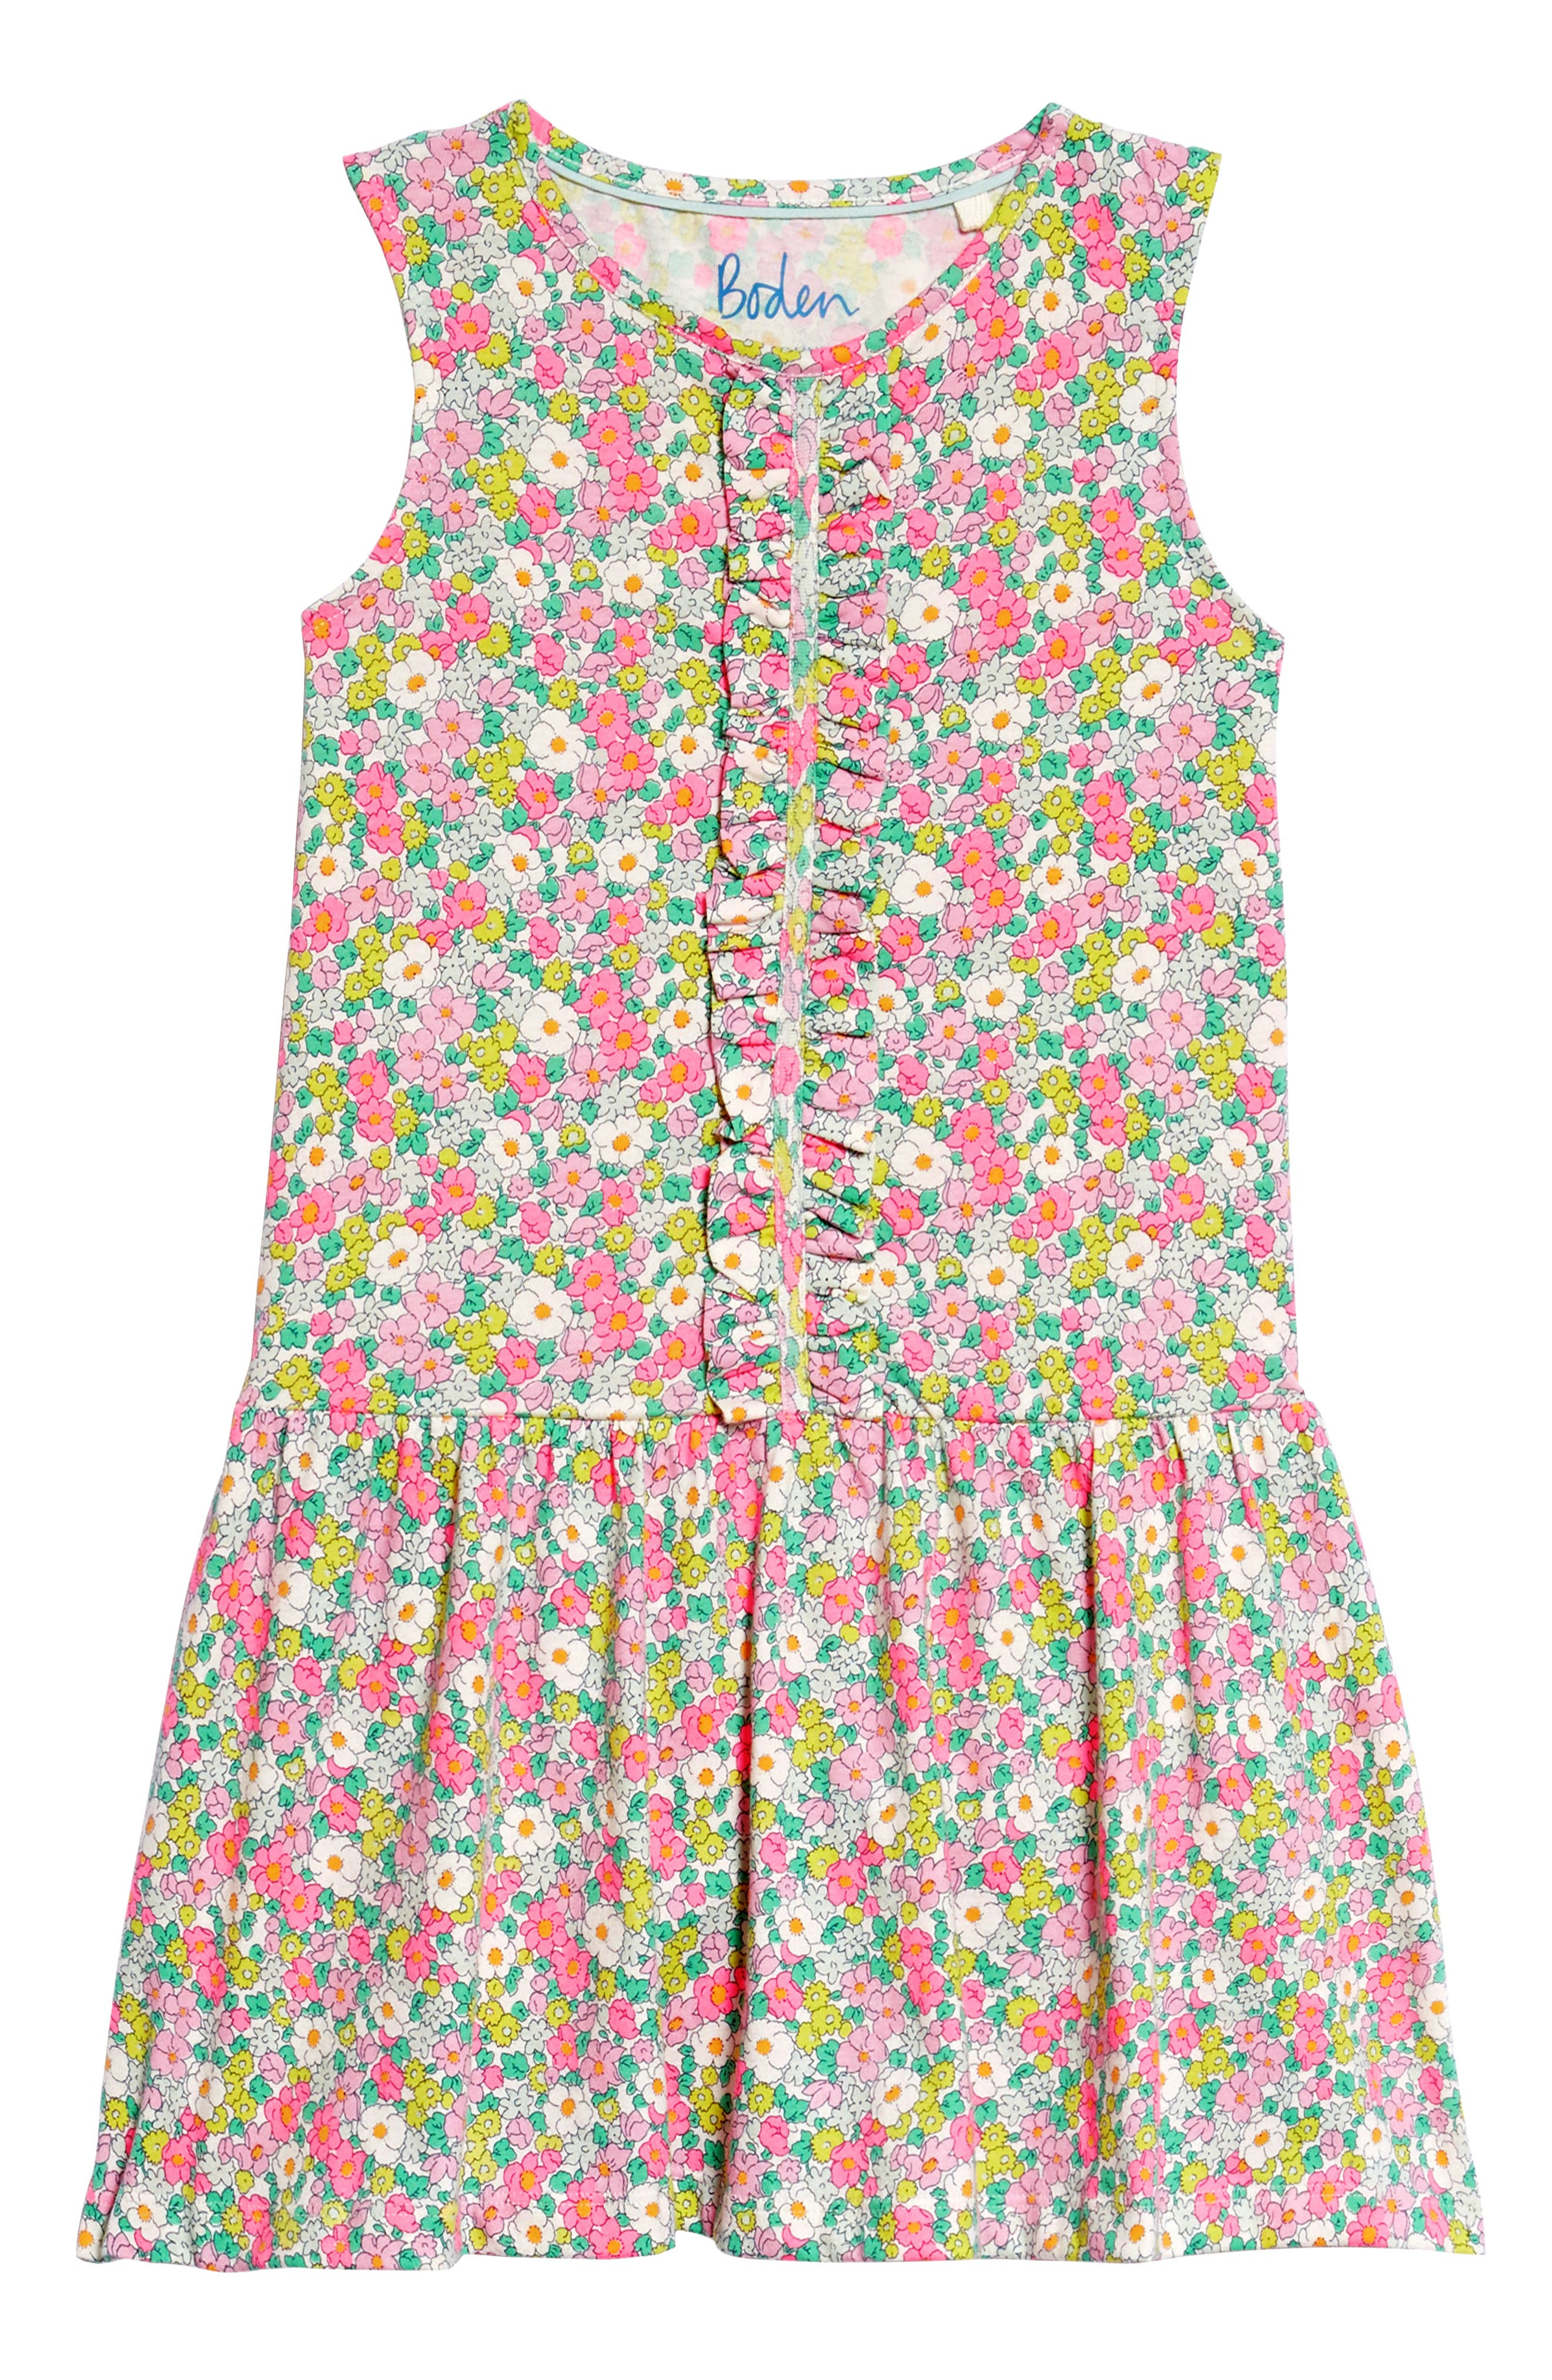 Ruffle Jersey Dress,                             Main thumbnail 1, color,                             Knockout Pink Vintag